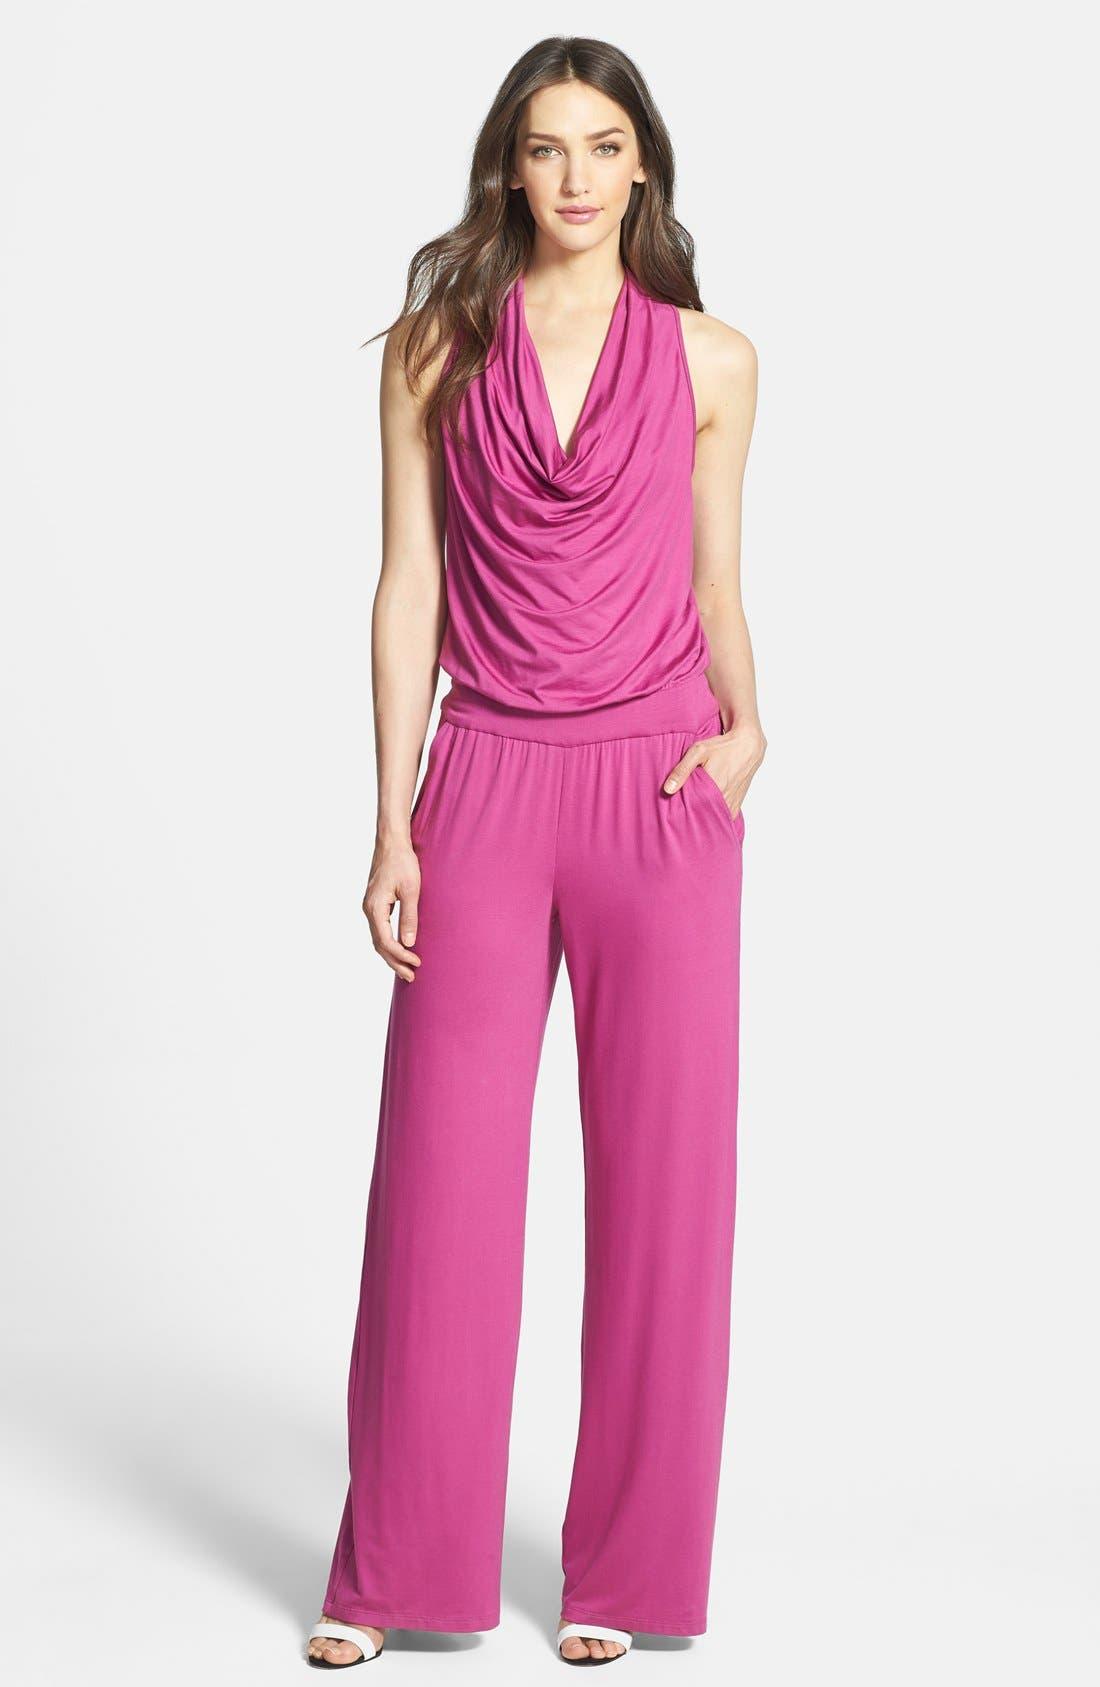 Alternate Image 1 Selected - Trina Turk 'Raissa' Jersey Jumpsuit